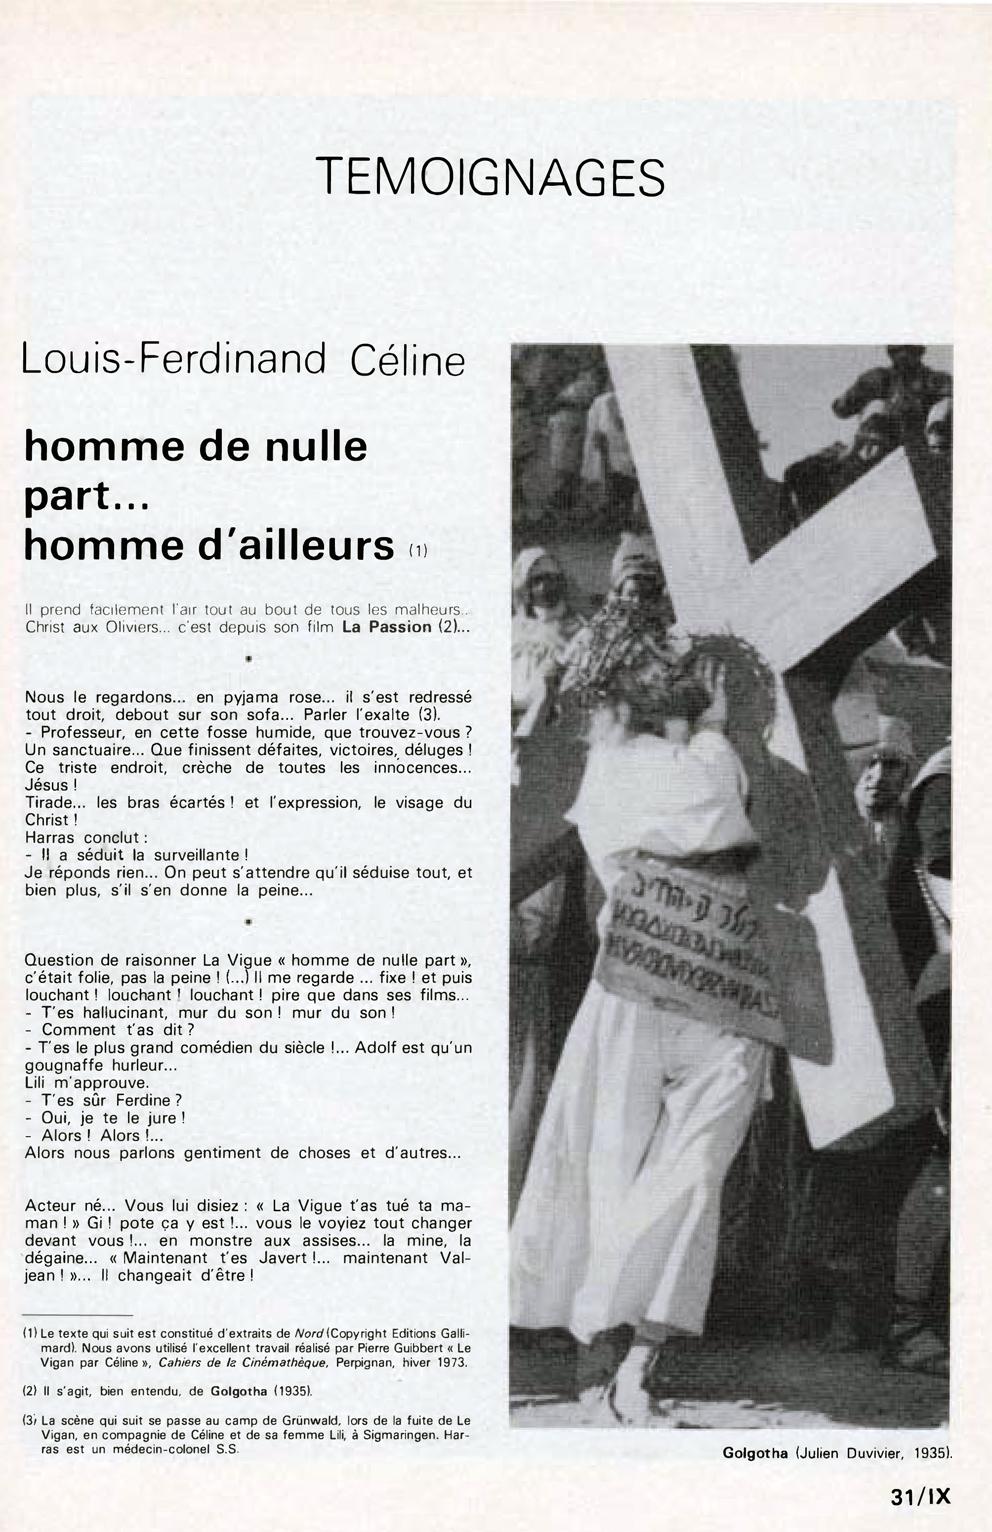 d931f23caf8 In Memoriam Robert Le Vigan vu par Louis-Ferdinand Céline dans L Avant  Scène n° 215 de novembre 1978